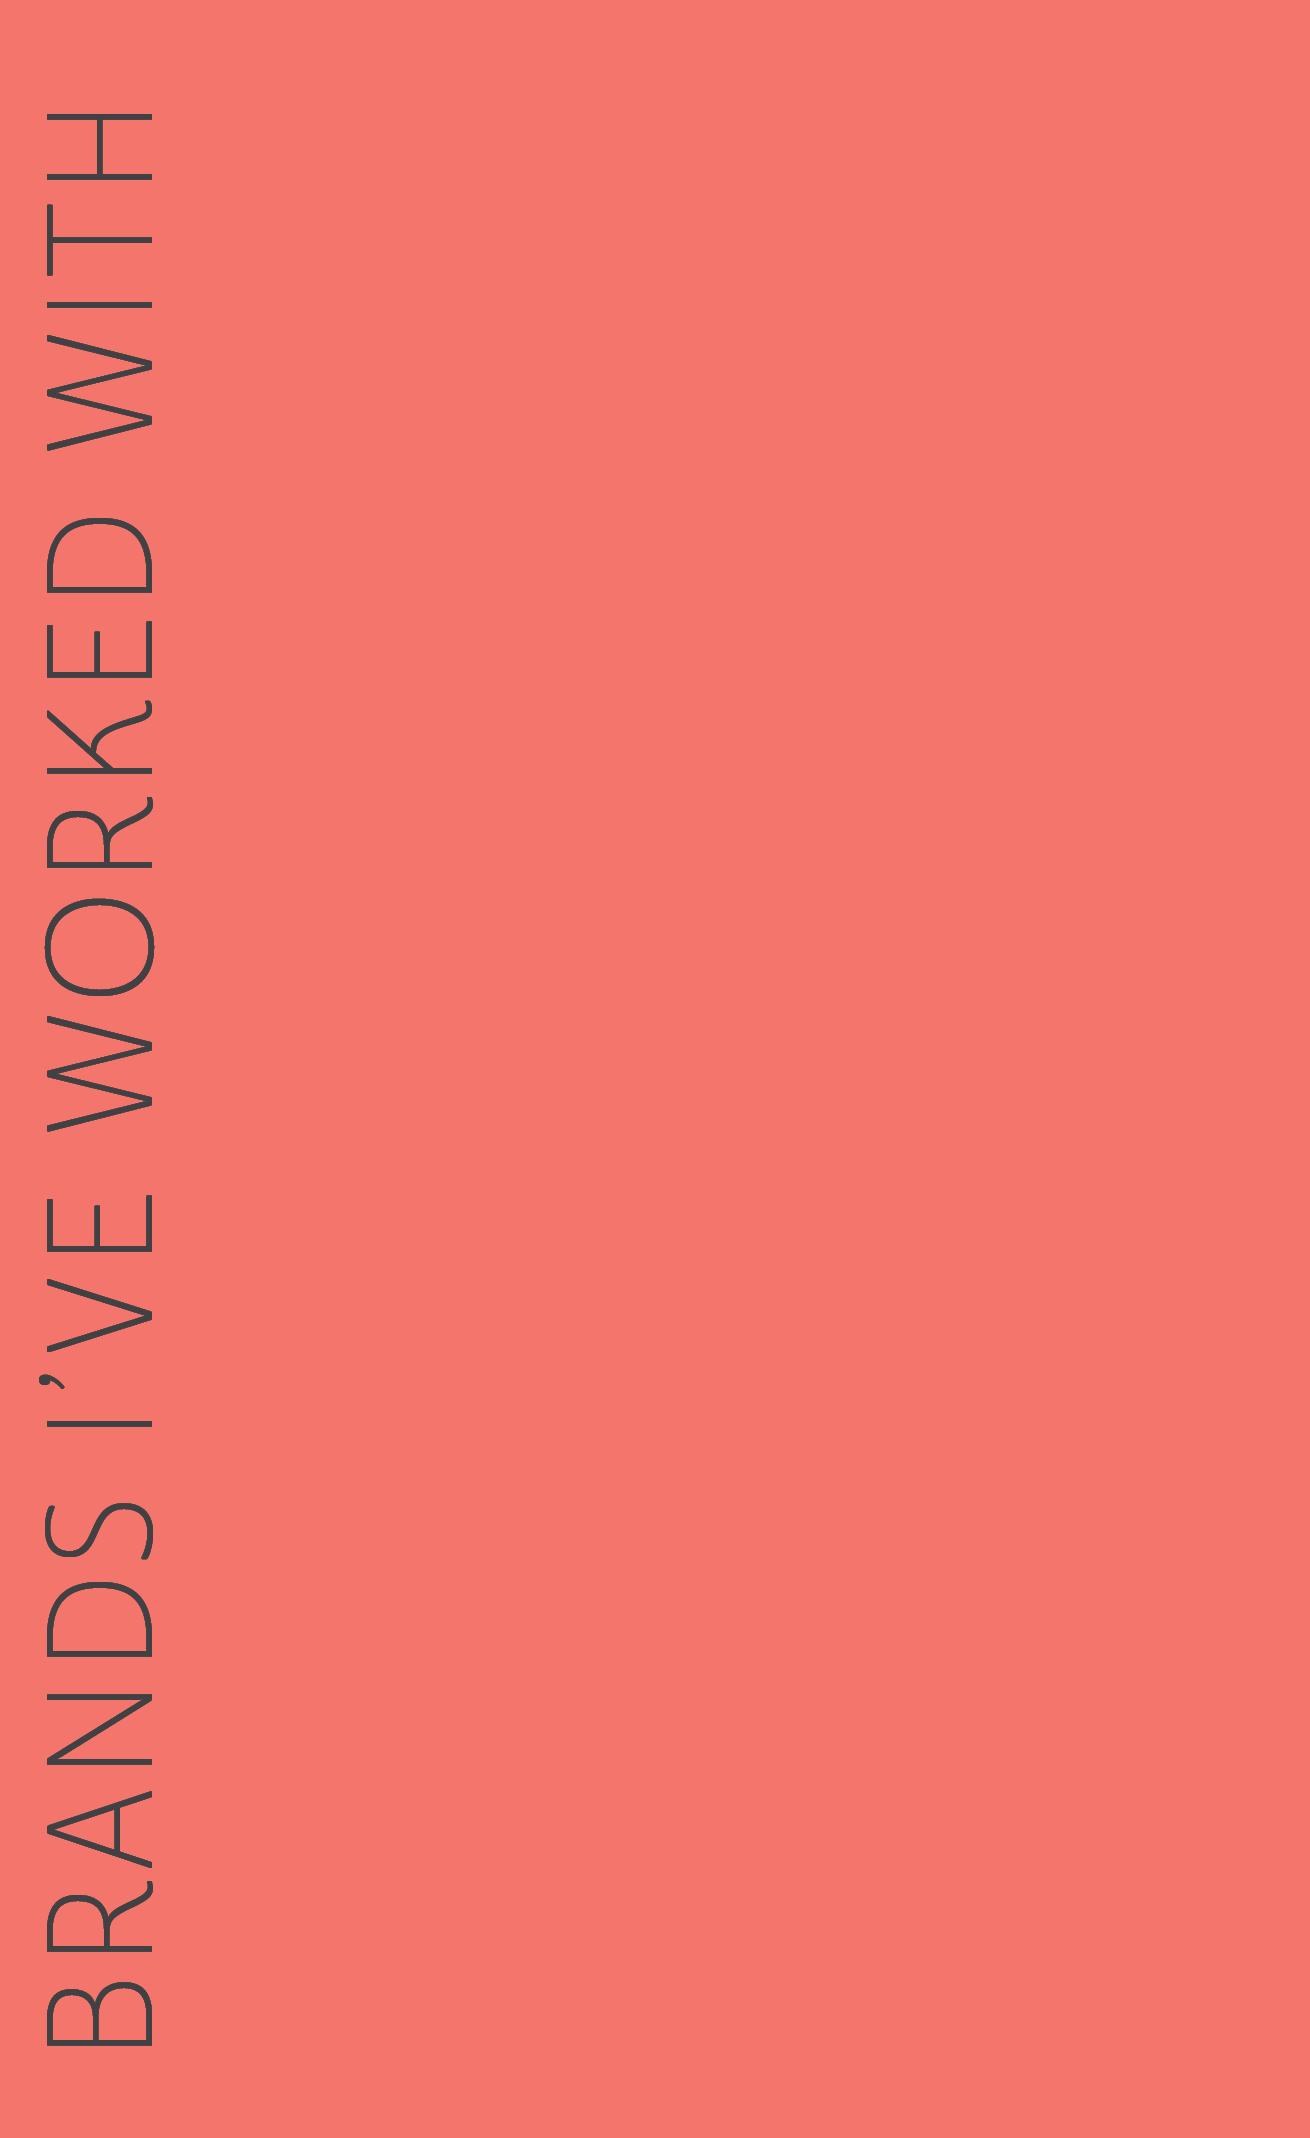 Click for examples: - Baby DoveOreidaHeftySmile BrilliantRe-Play RecycledEvivo ProbioticsCarpet and Rug InstituteSmithfieldRhonna DesignsHappy Baby FamilyNanobebeErgobabyAmazonGrove CollaborativeBeauty CounterFebrezeDockatotLillibabyOllie WorldLorena Canal RugsJord